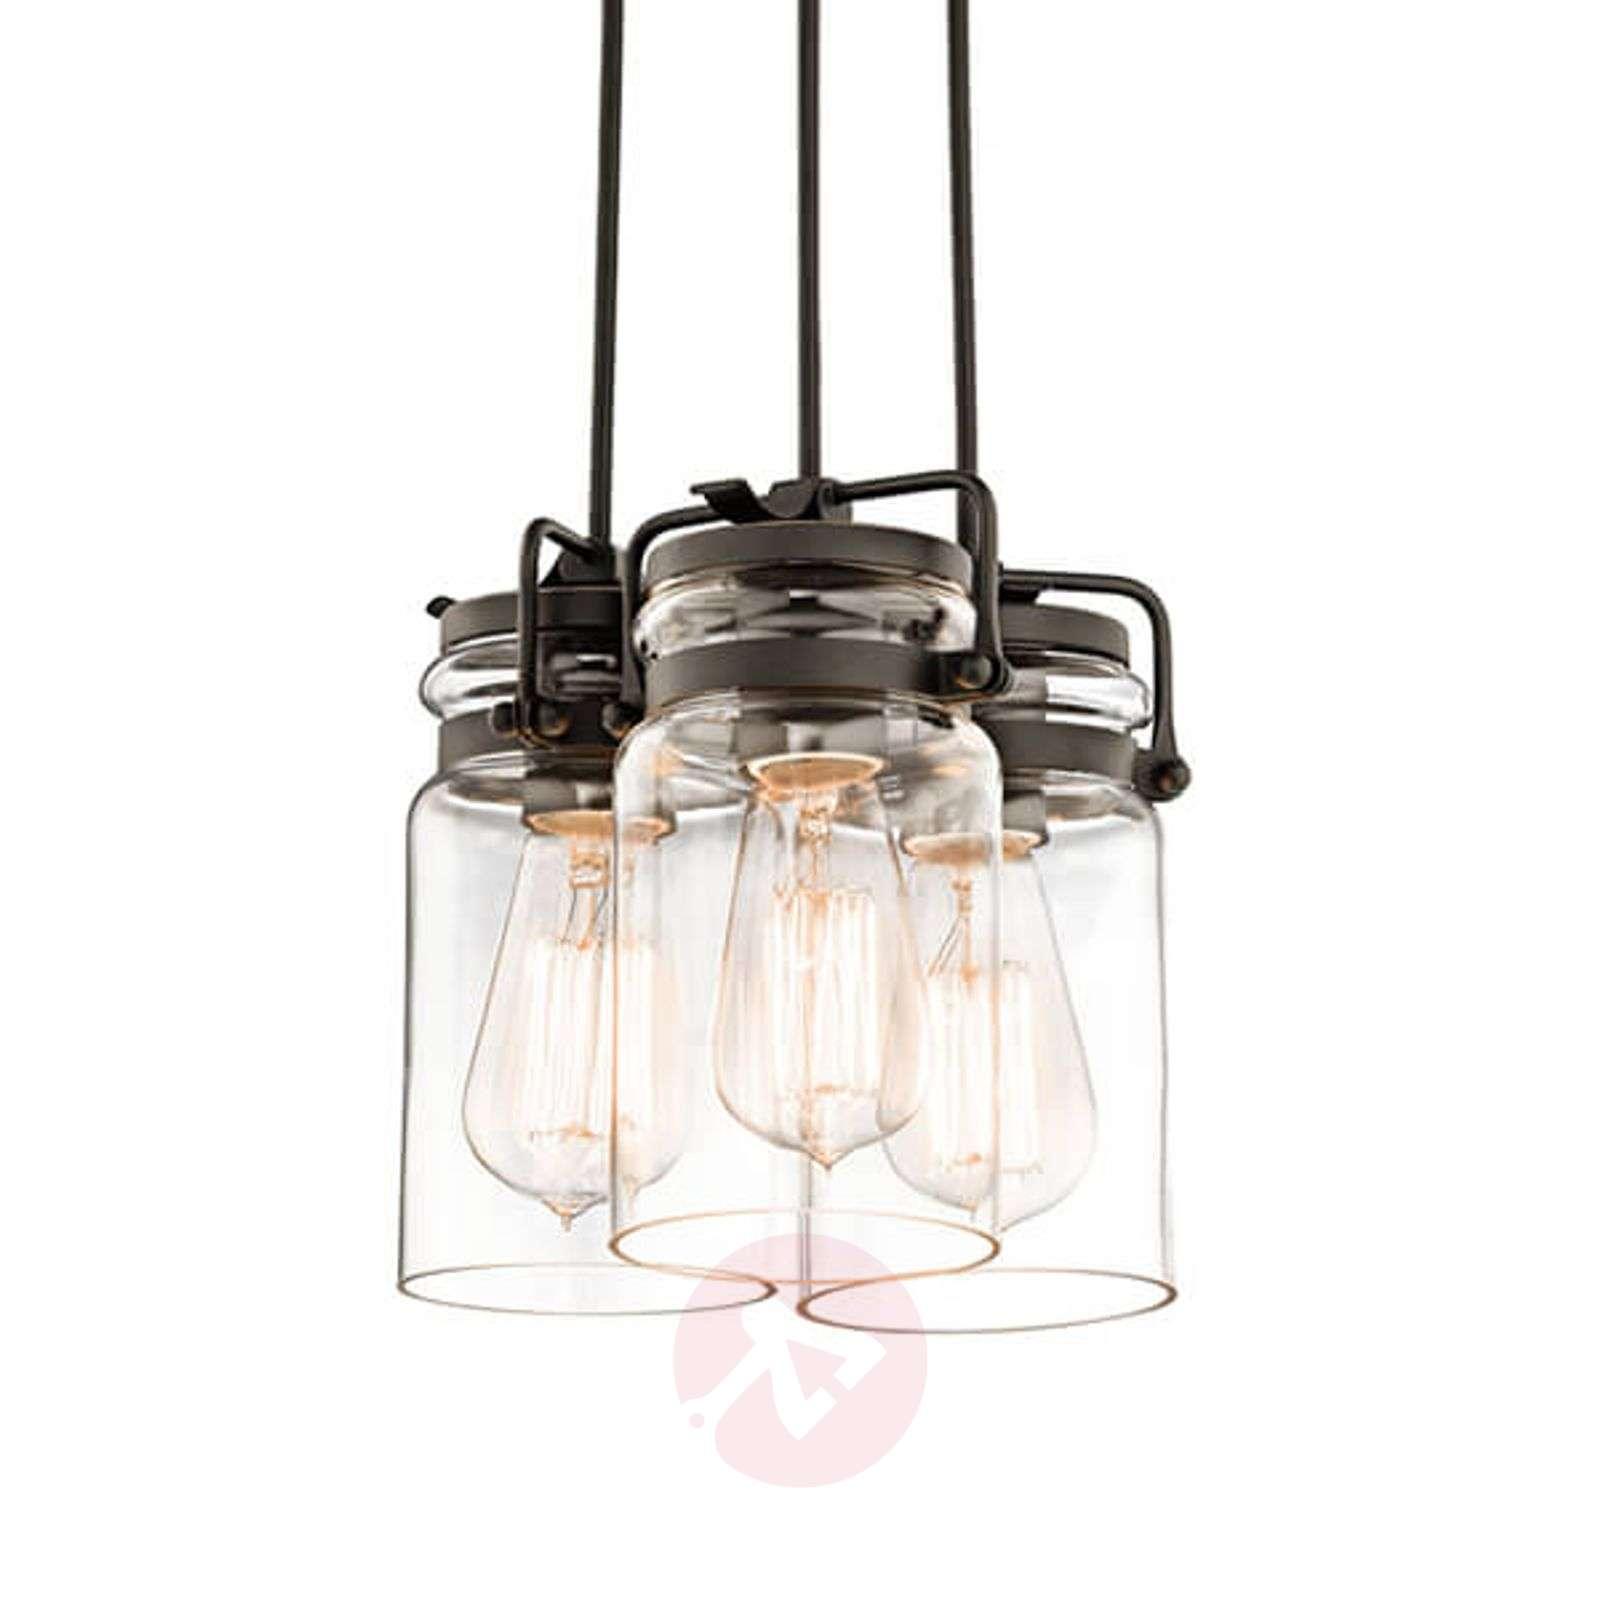 Bundled pendant light Brinley three-bulb-3048600-01